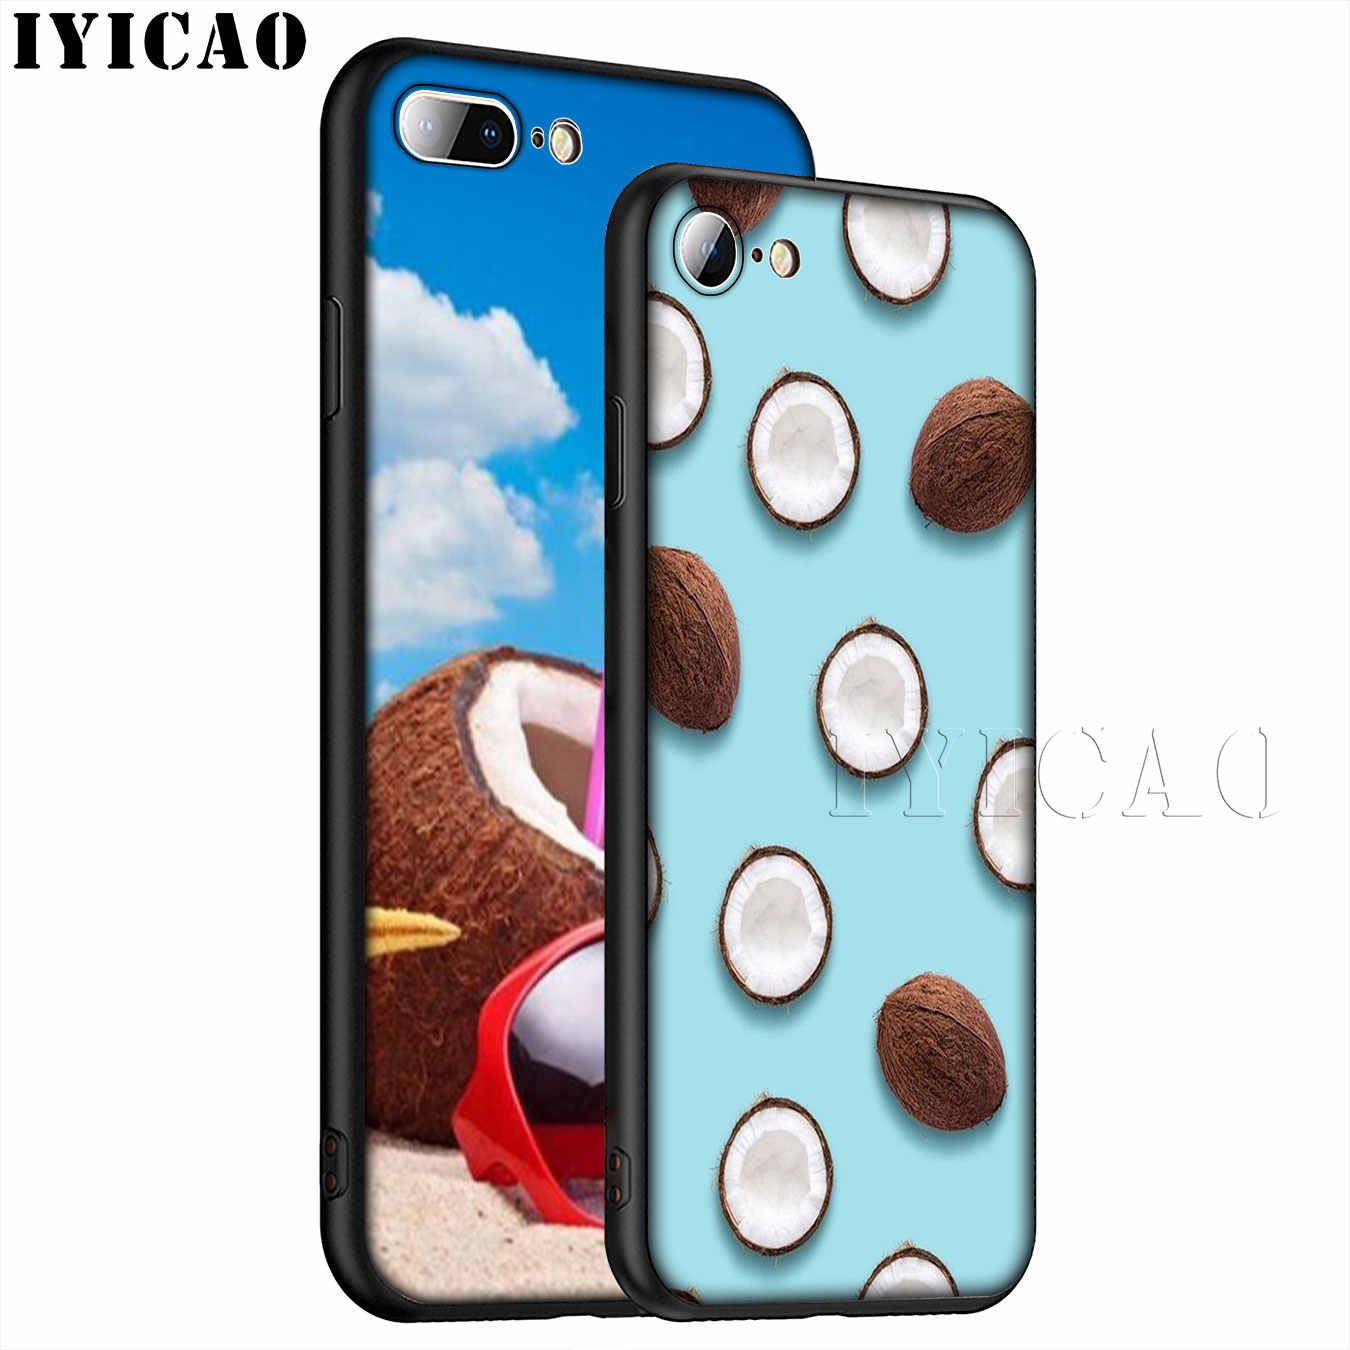 Frutas de coco no céu azul praia areia macio silicone caso do telefone para o iphone xr x xs 11 pro max 6 s 7 8 plus 5 5S se 10 capa